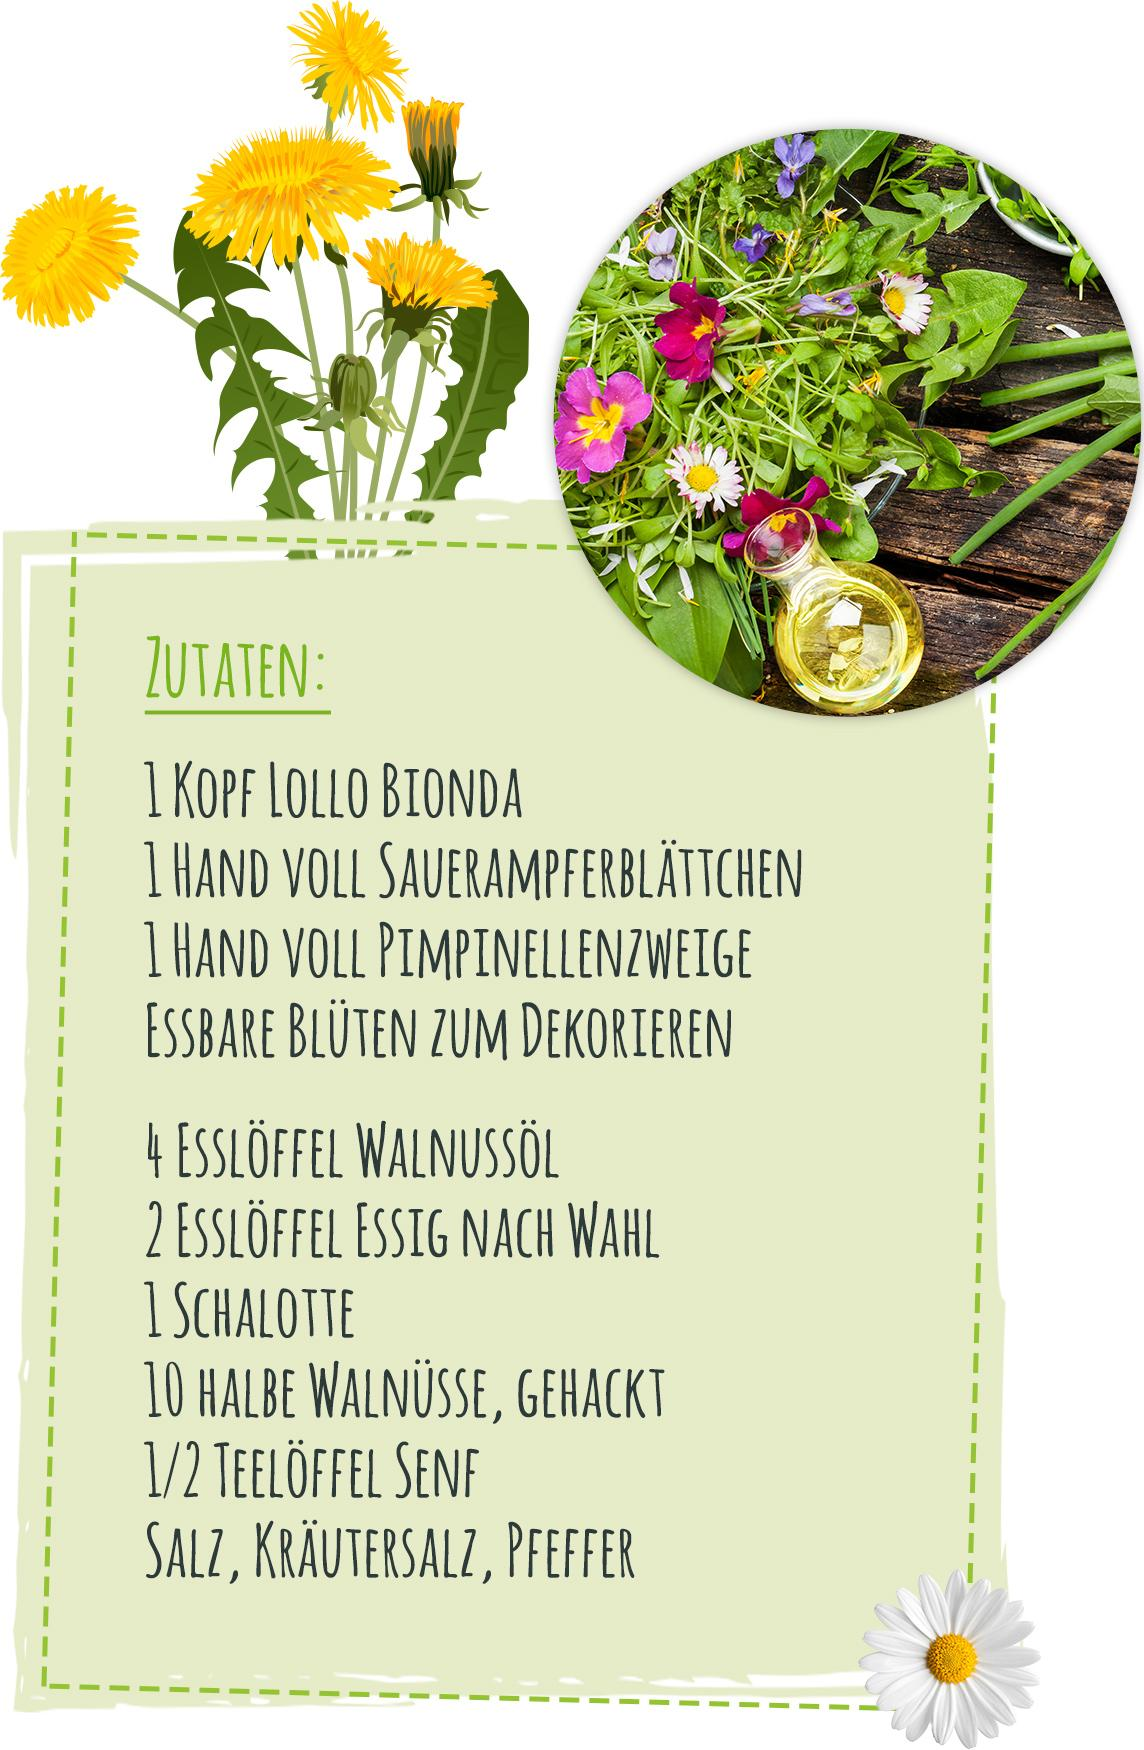 Rezept für Blütensalat